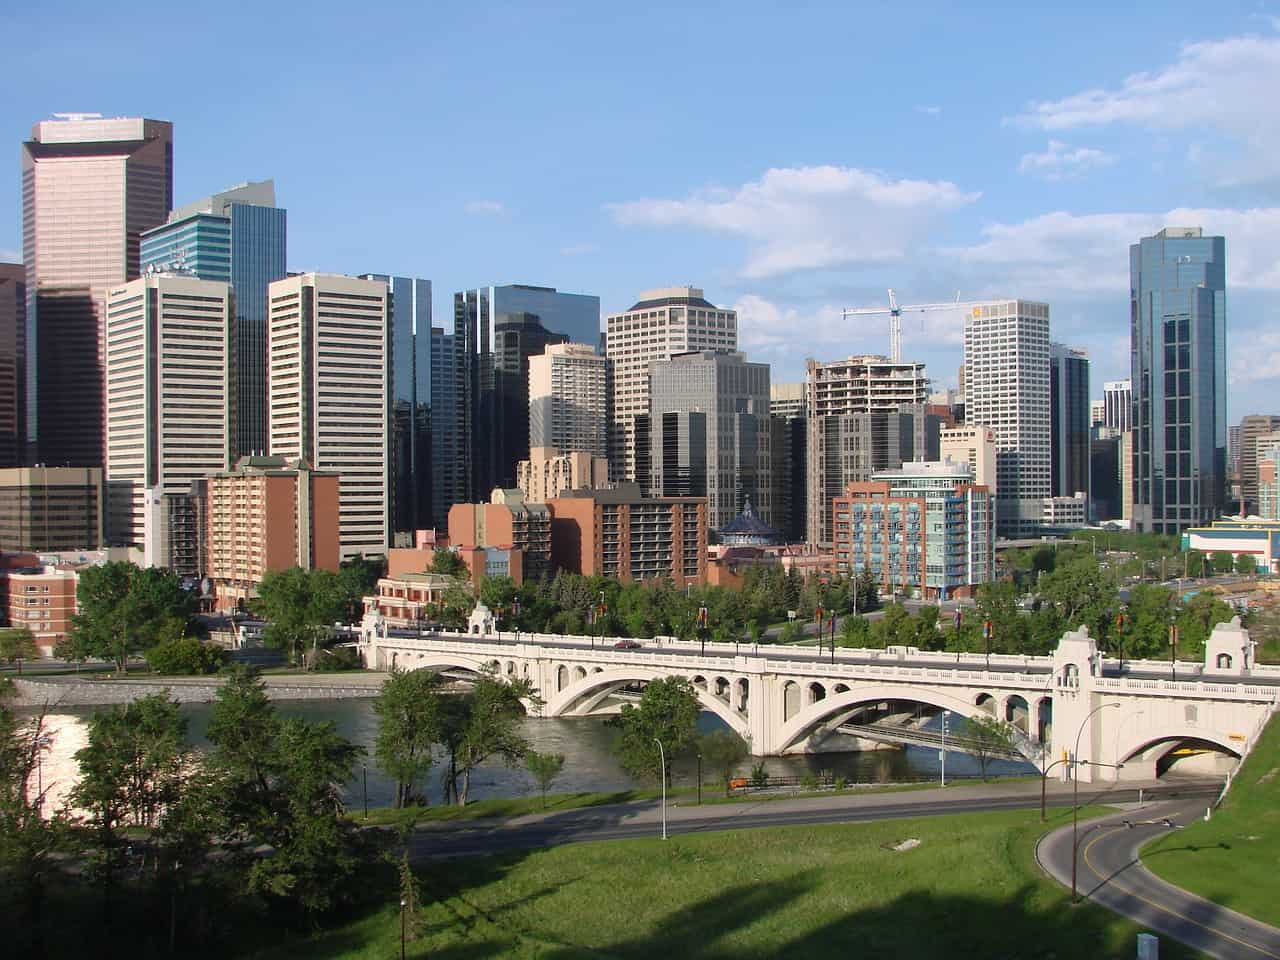 Walking tour in Calgary